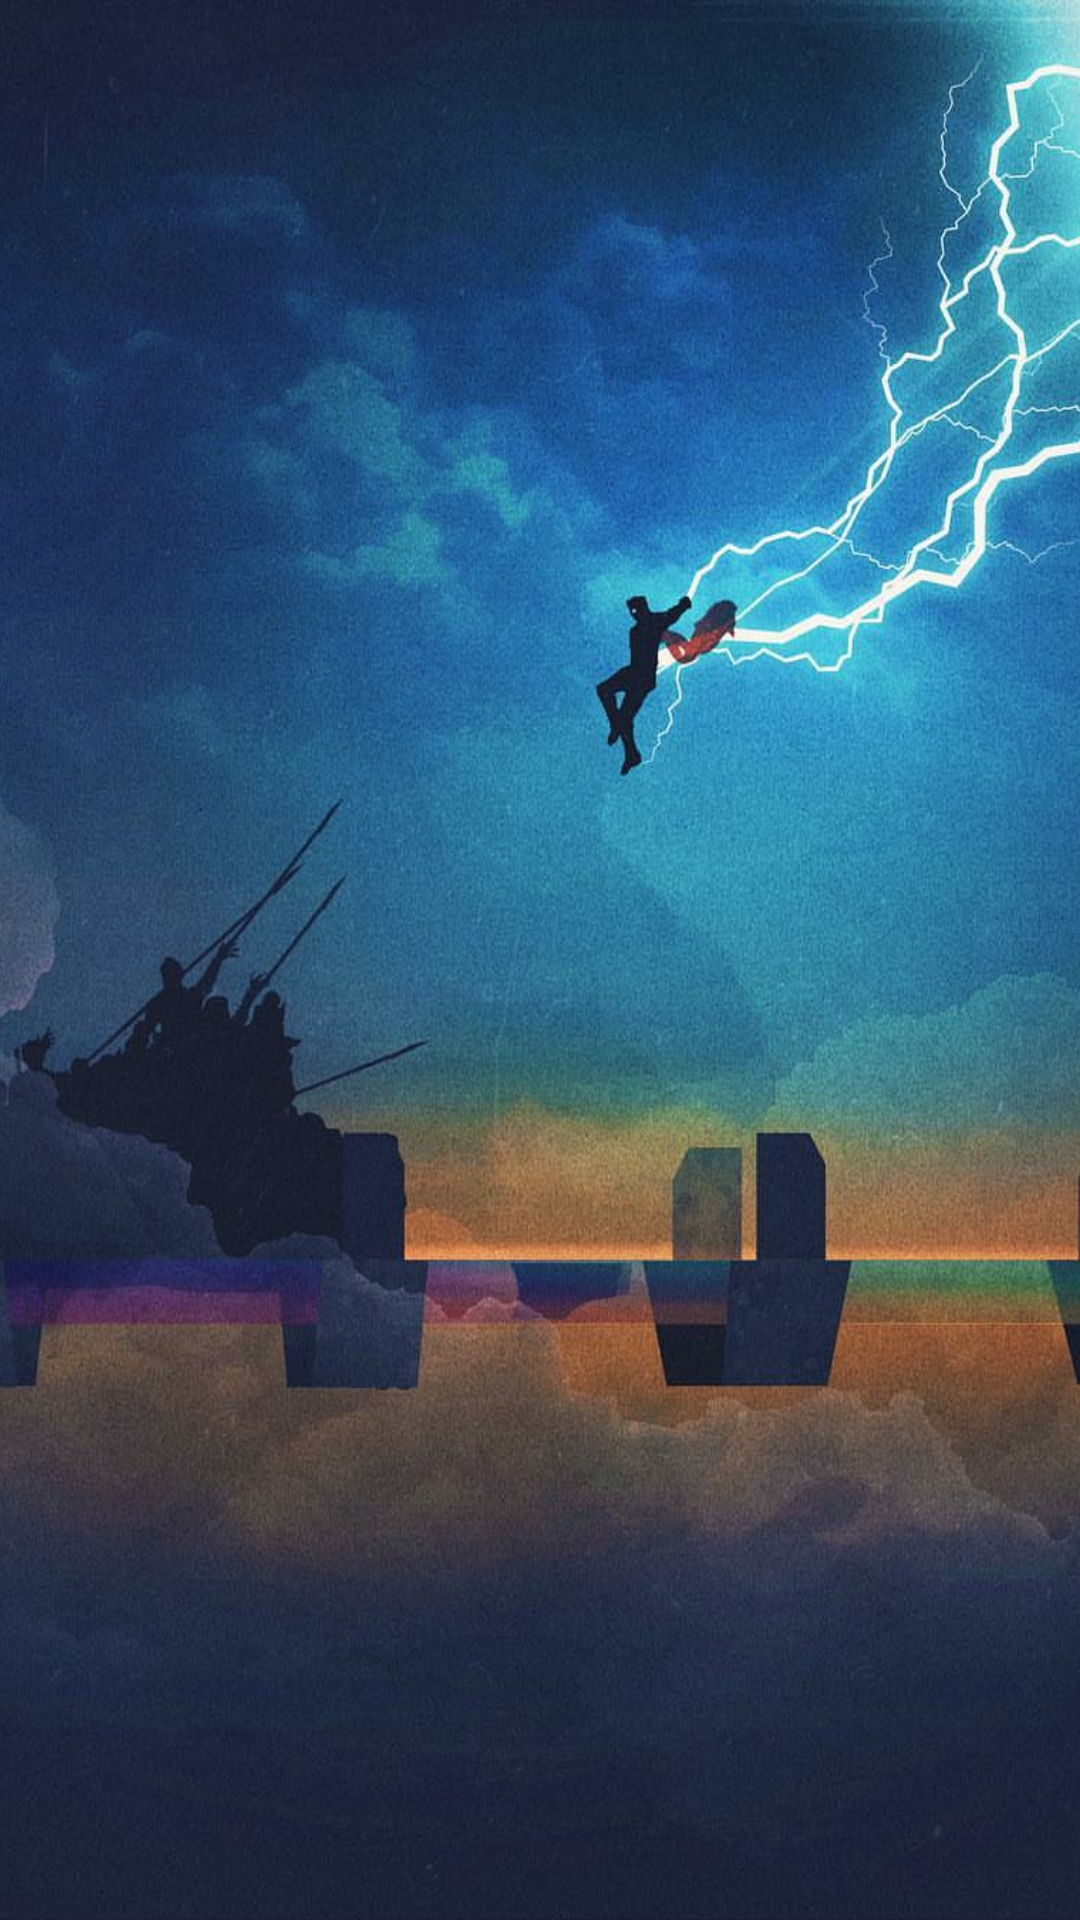 Doctor Iphone Wallpaper Thor Stormbreaker Attack Iphone Wallpaper